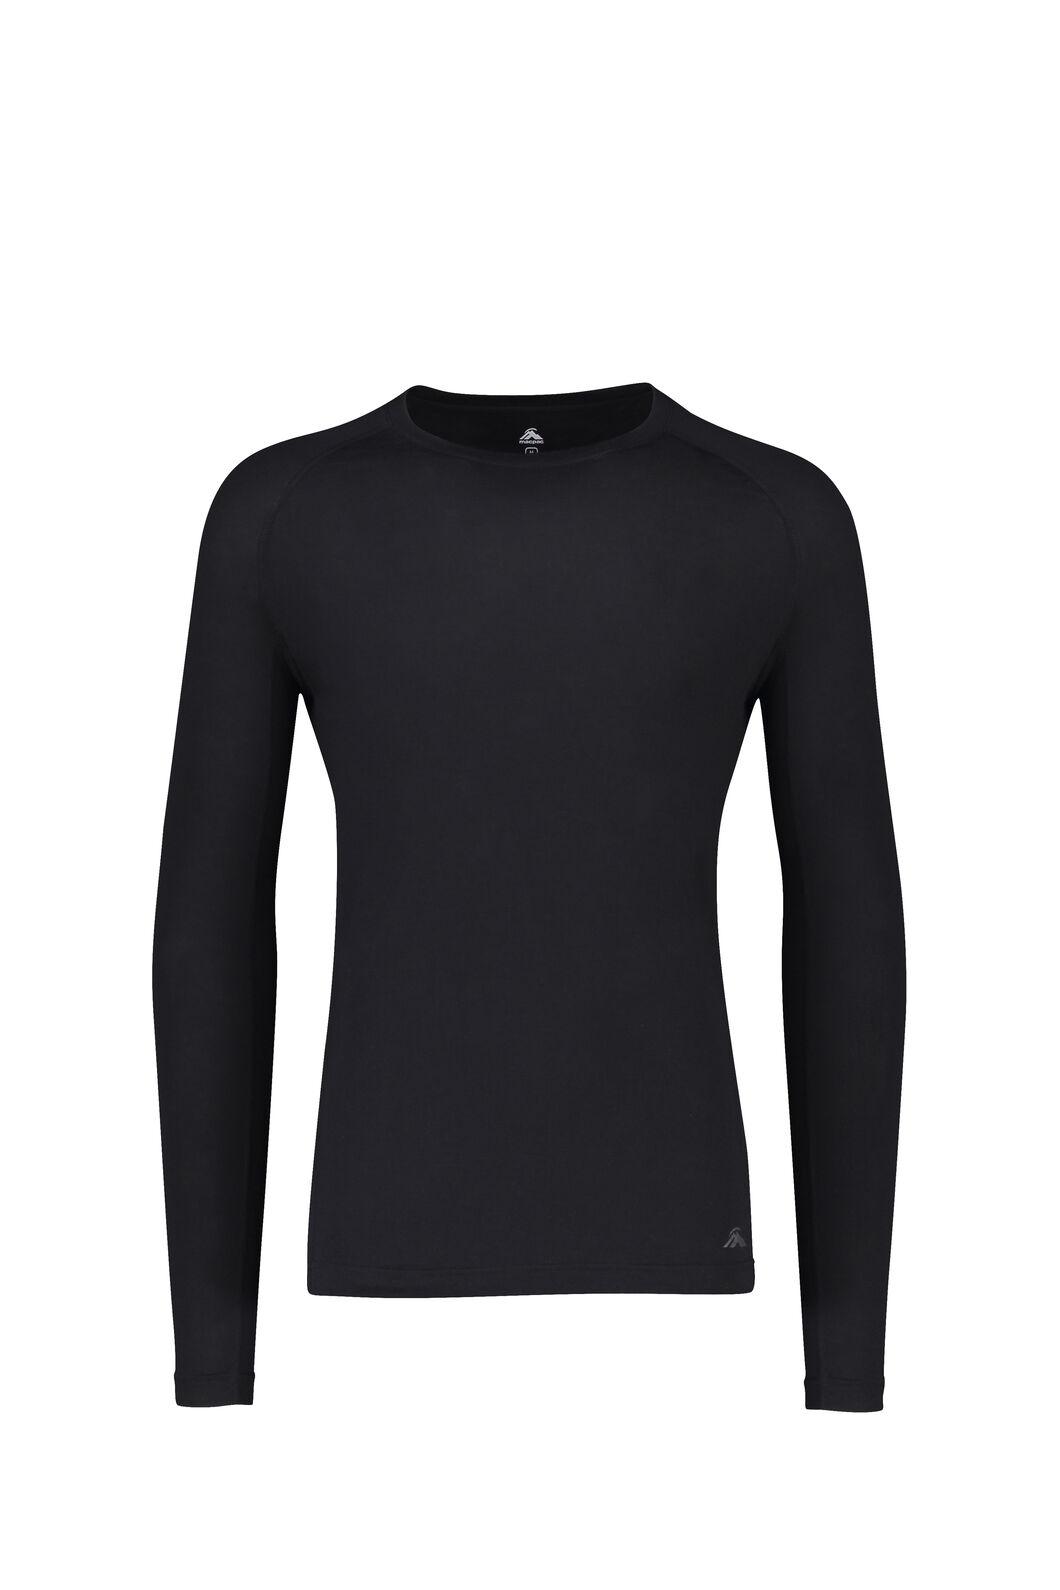 Macpac 150 Merino Long Sleeve Top - Men's, Black, hi-res